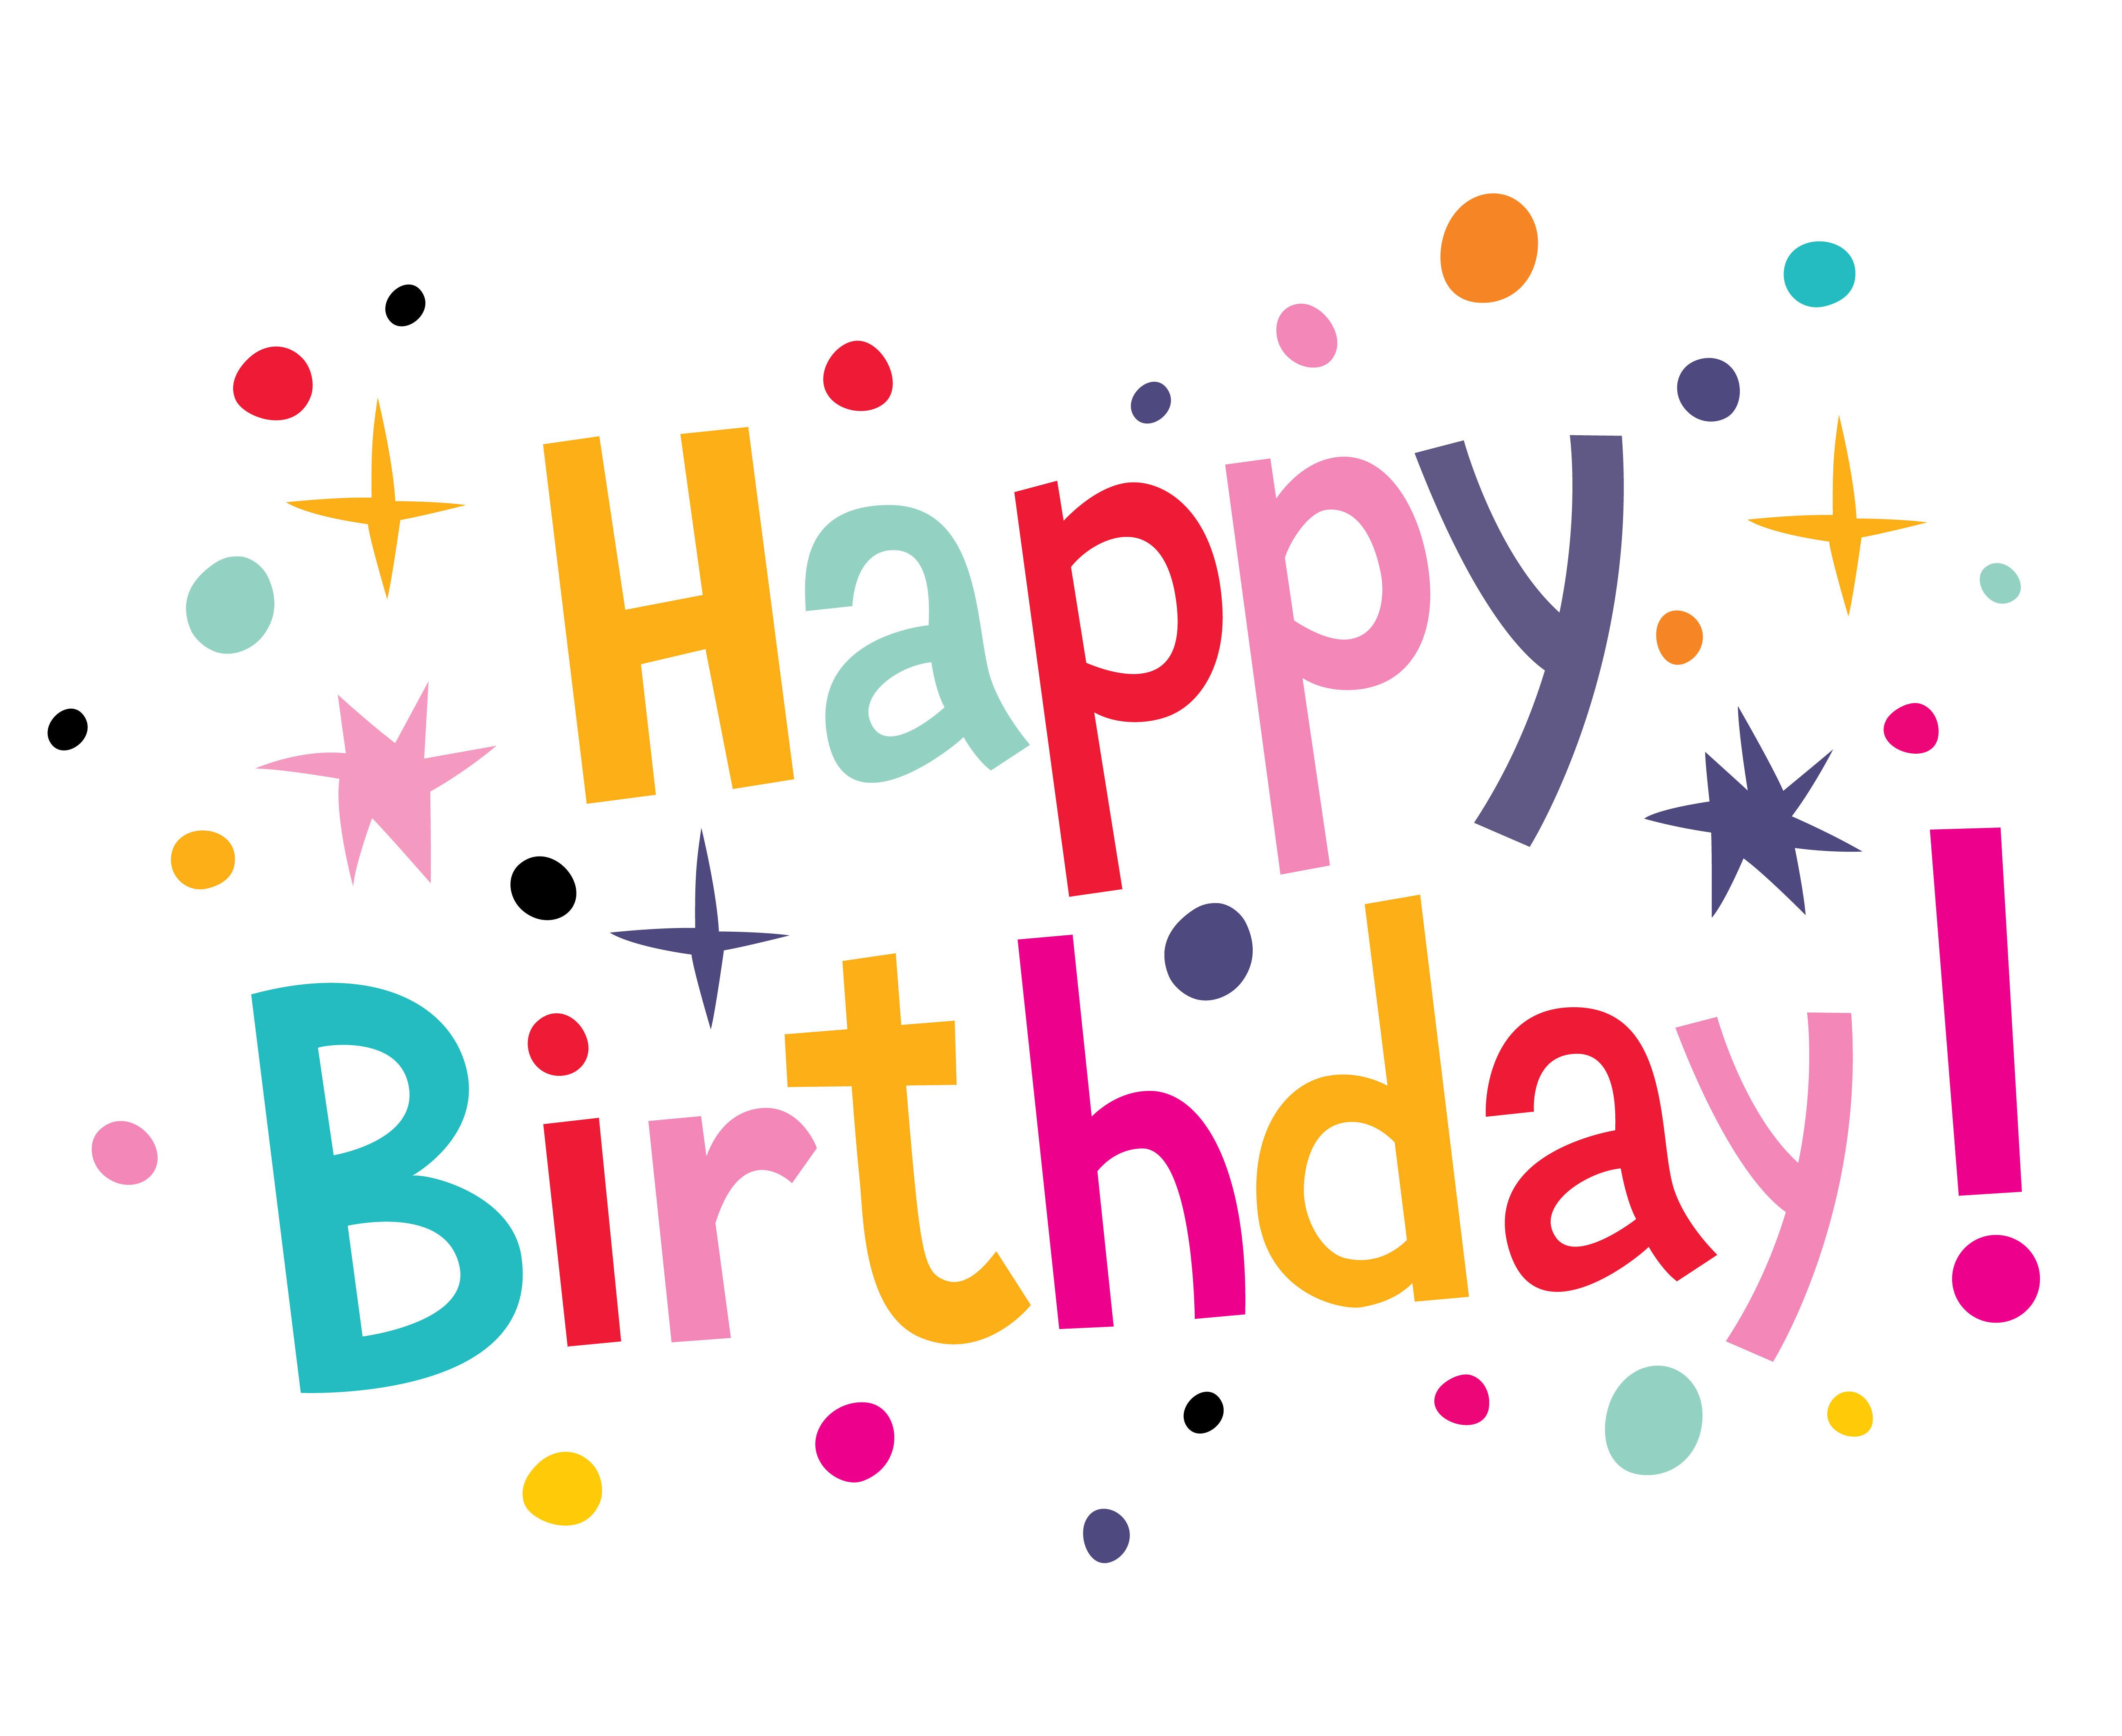 happy birthday Happy Birthday Im Pictures, Photos, and Images for Facebook  happy birthday